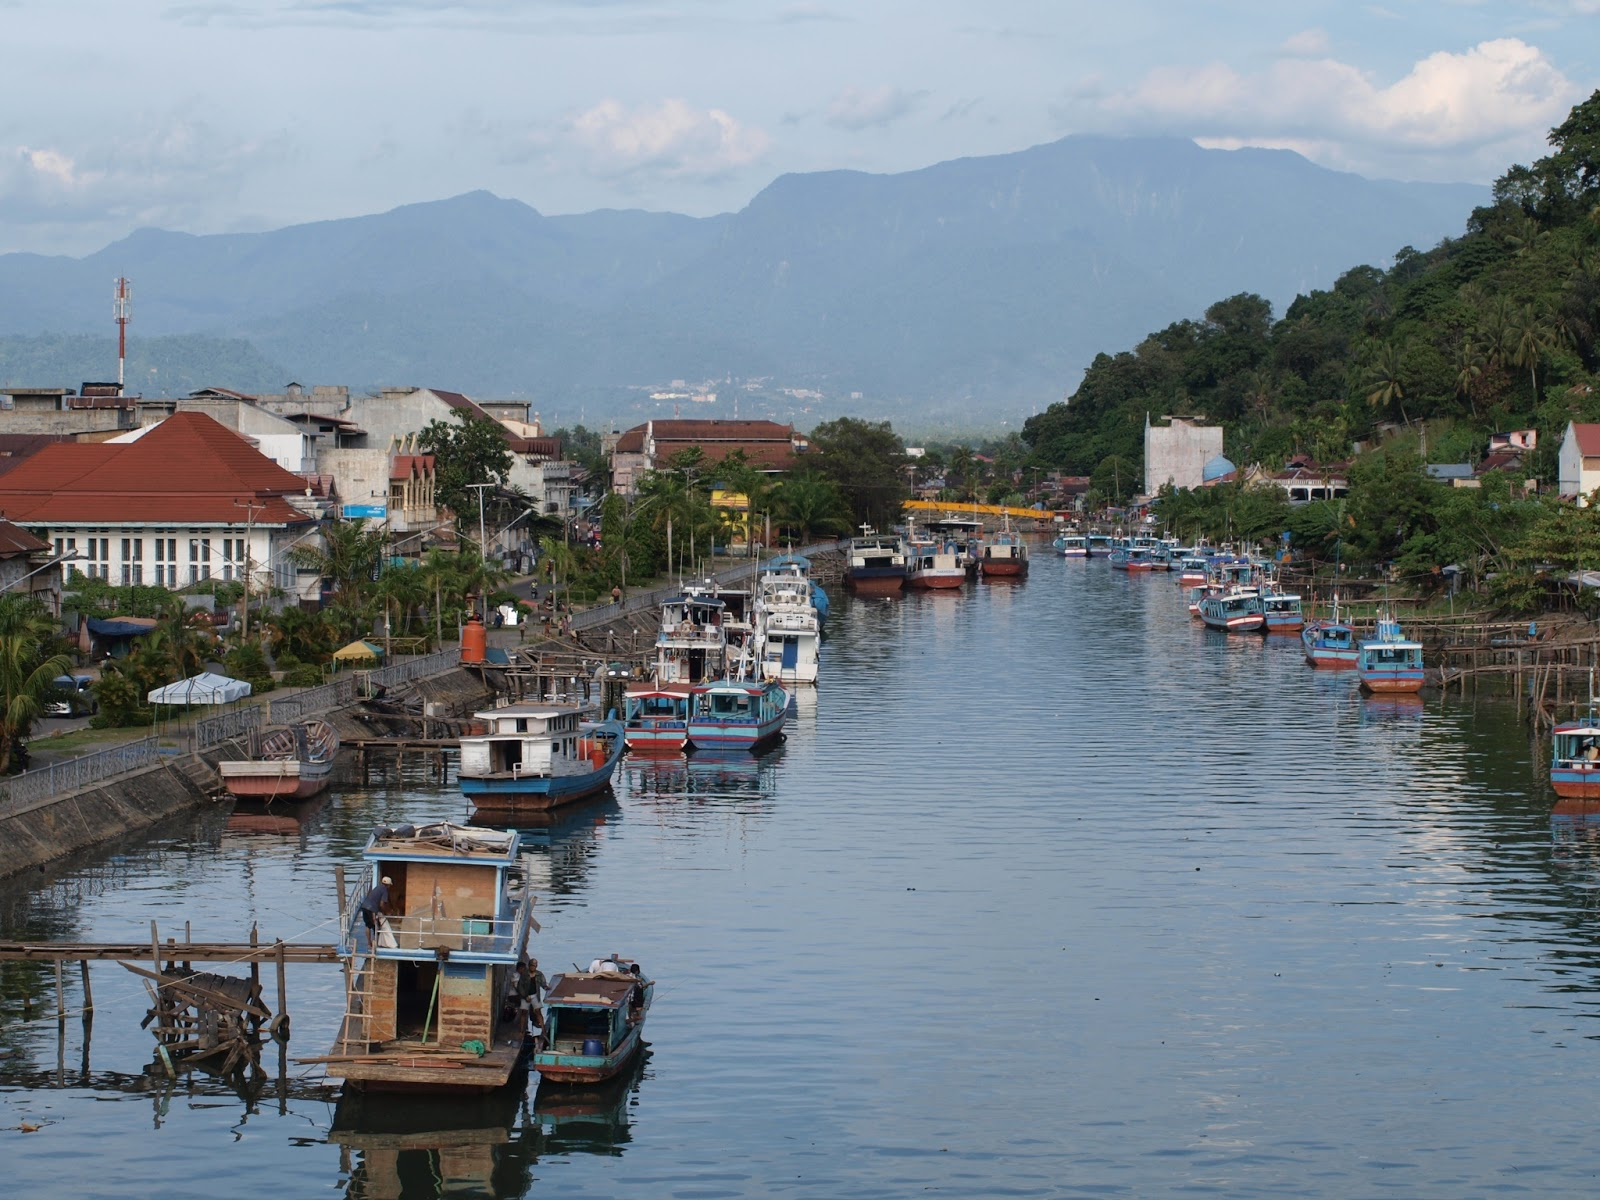 Wisata Minangkabau Menikmati Senja Jembatan Siti Nurbaya Pelabuhan Muaro Kisah